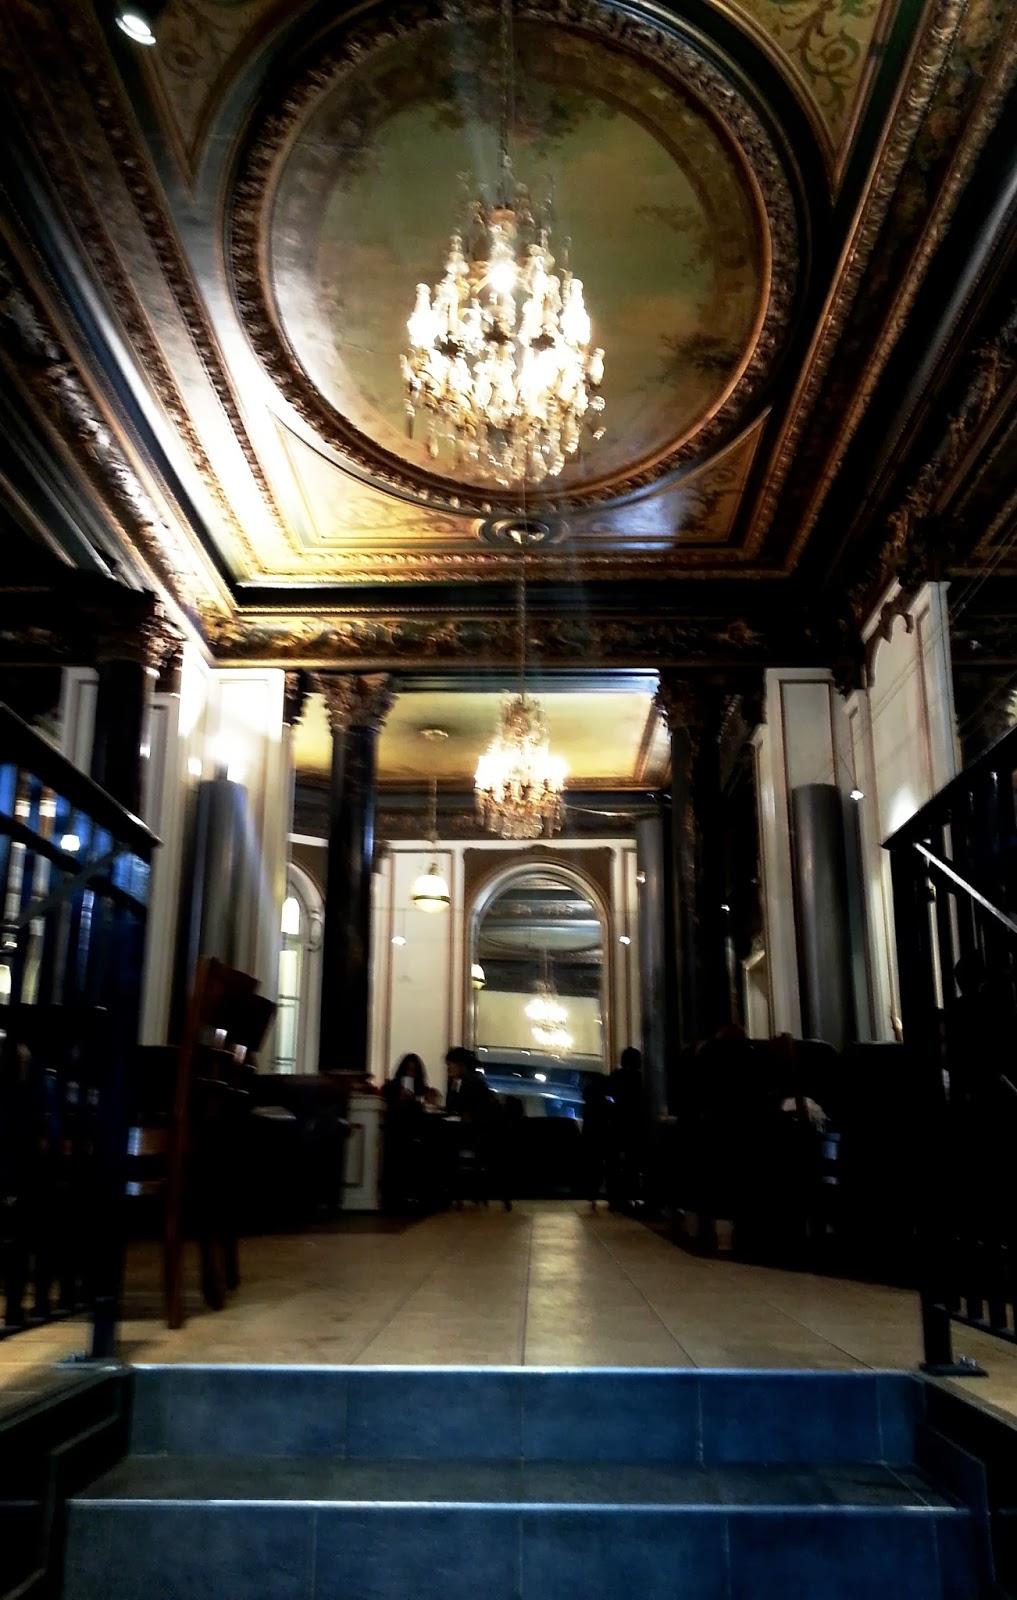 Stevige Leren Bank.Out In Paris Koffiemokken En Beschilderde Plafonds